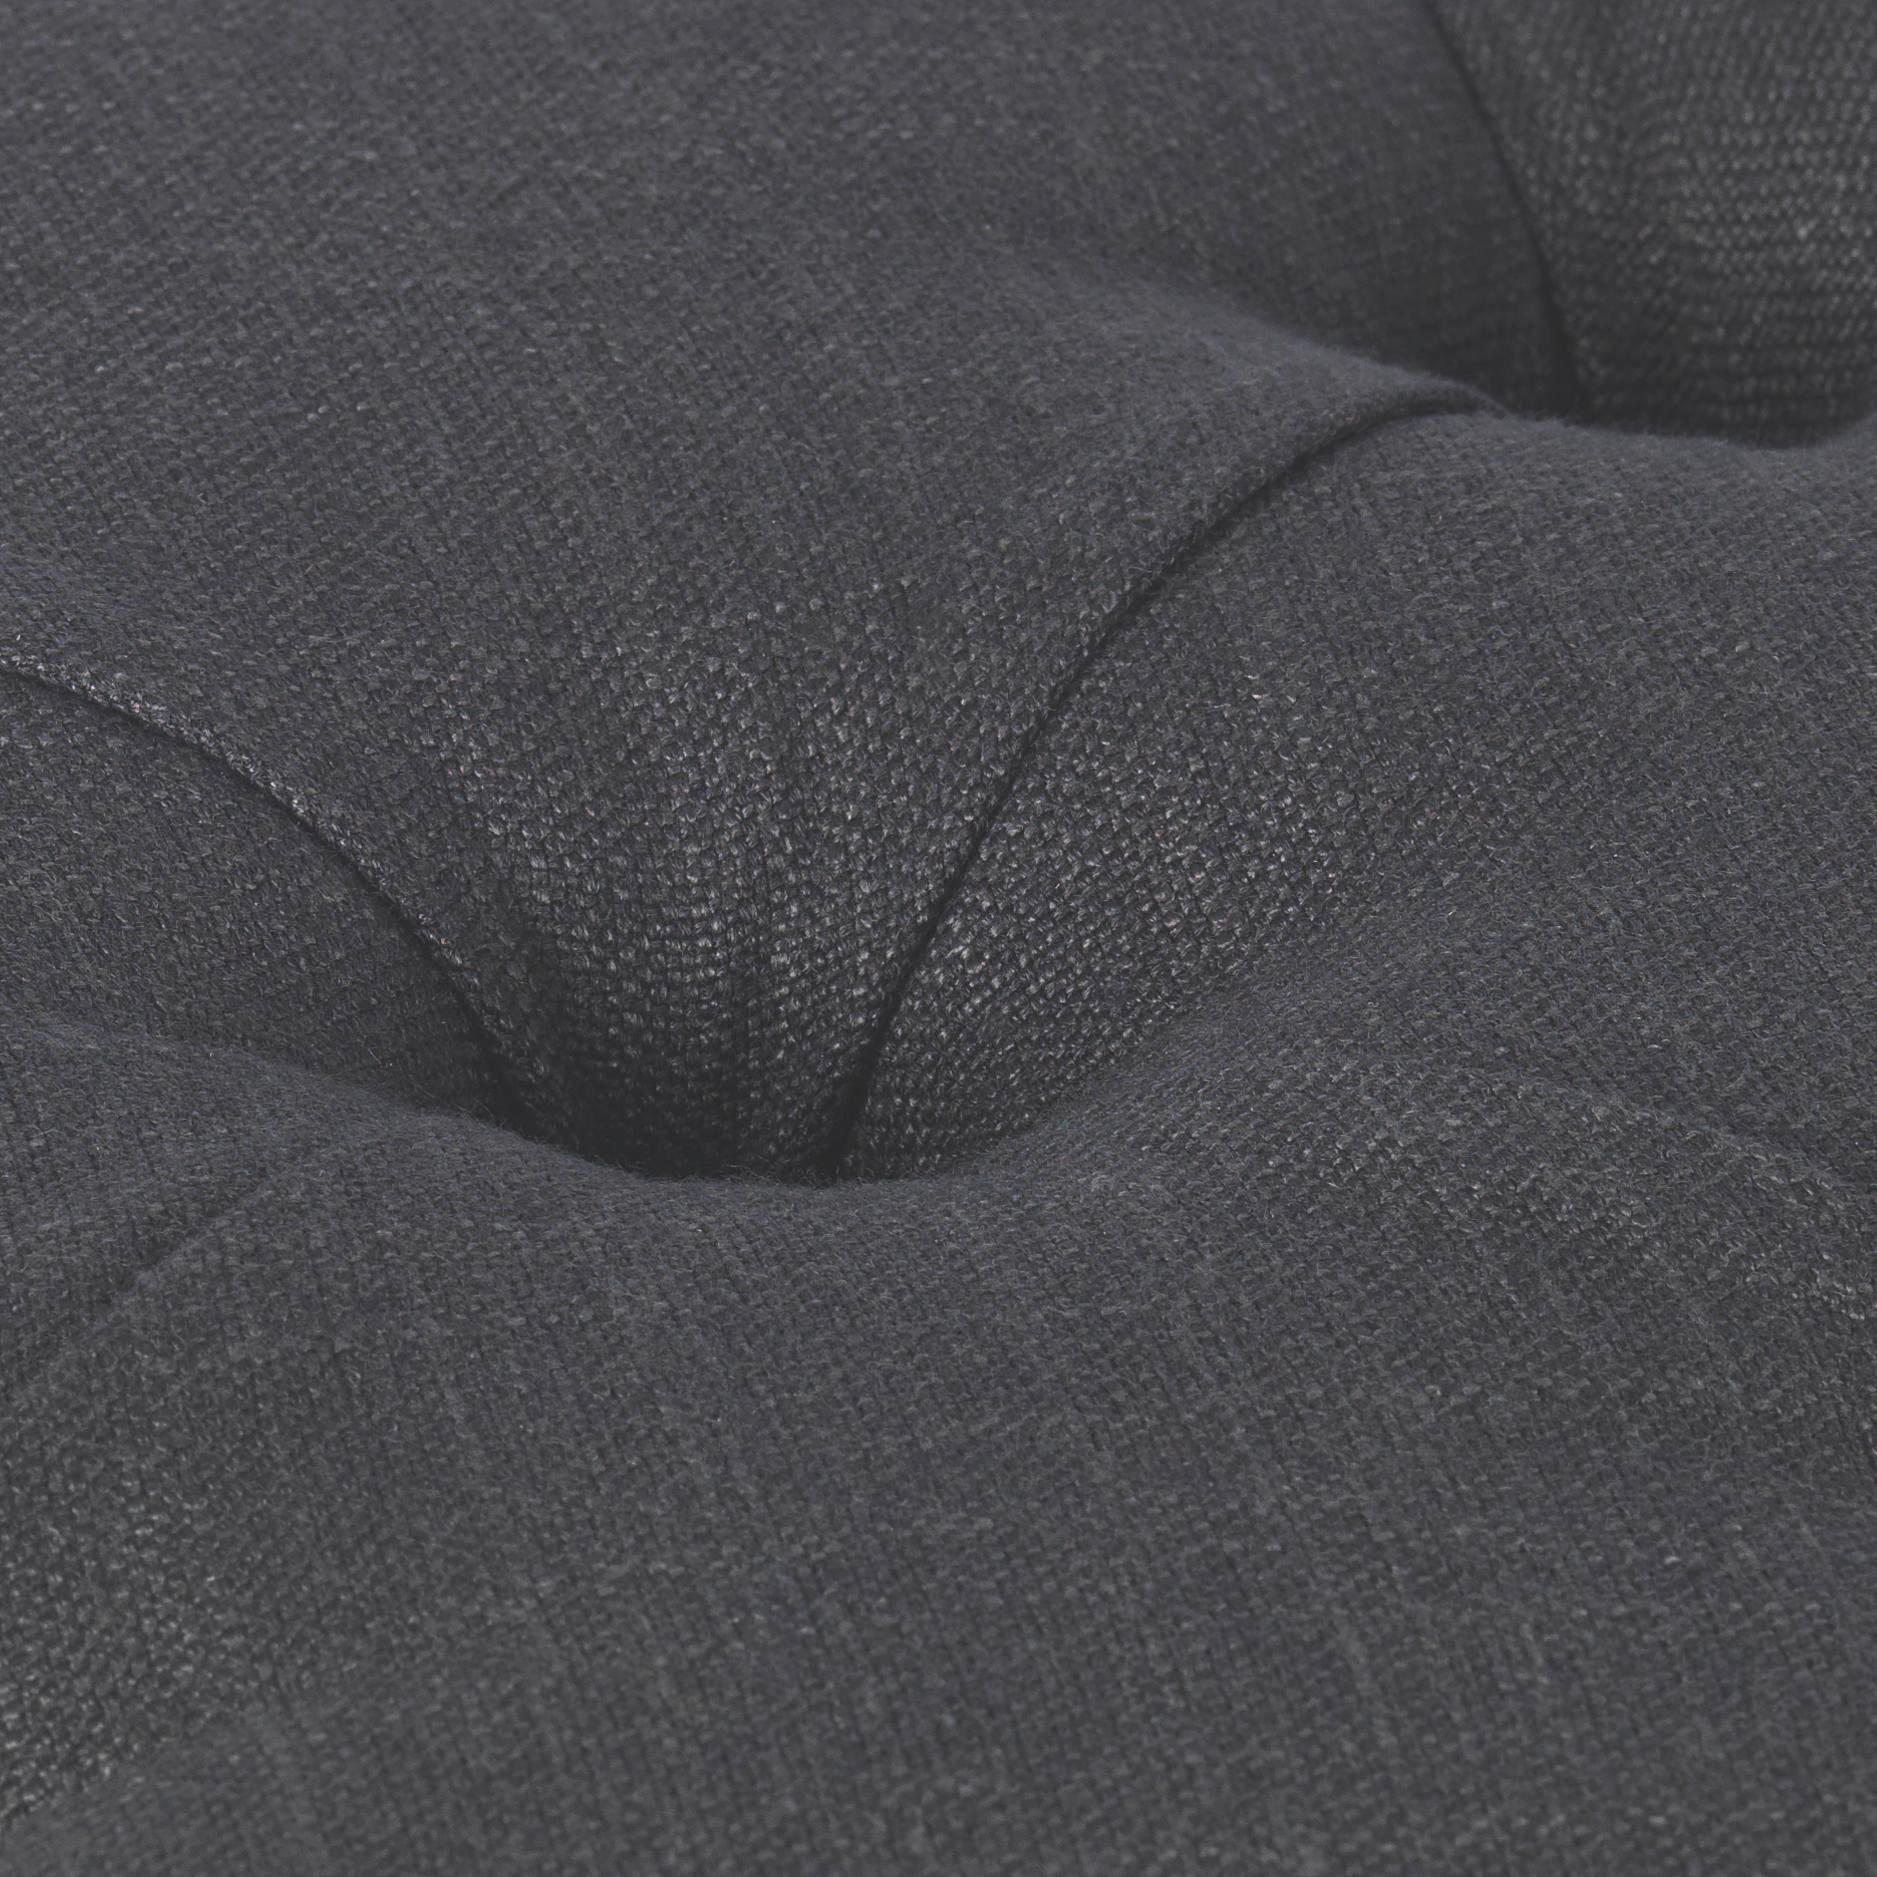 Bettbank Monaco - Grau, ROMANTIK / LANDHAUS, Holz/Textil (80/40/40cm) - MÖMAX modern living